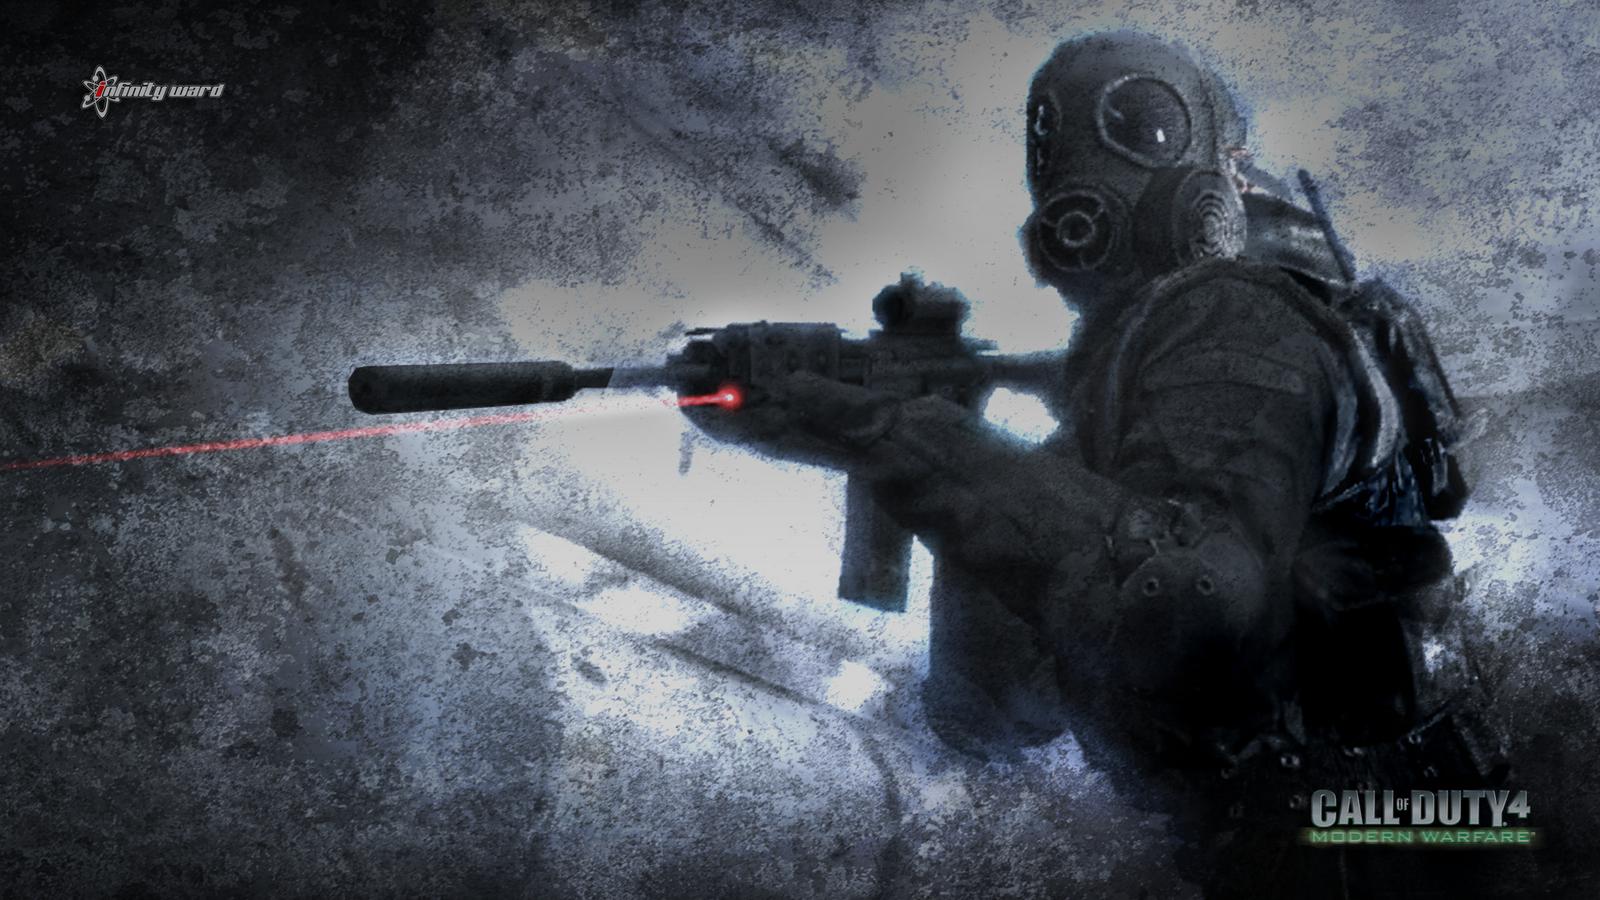 Call of Duty Modern Warfare 4 HD Wallpaper Logo Desktop Wallpapers 1600x900